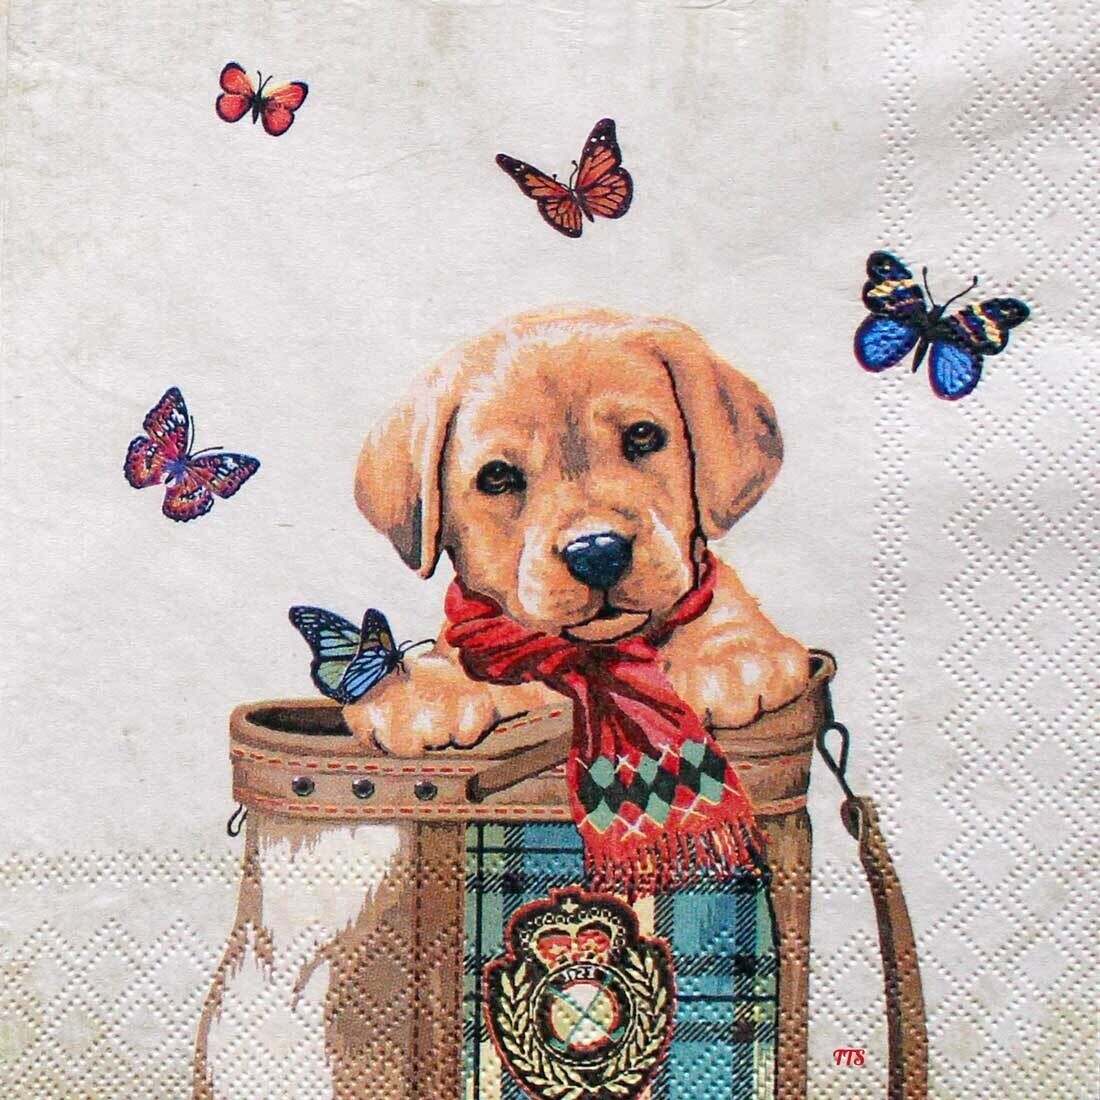 Decoupage Paper Napkins - Animal - Dog and Butterflies - Buddy (1 Sheet)